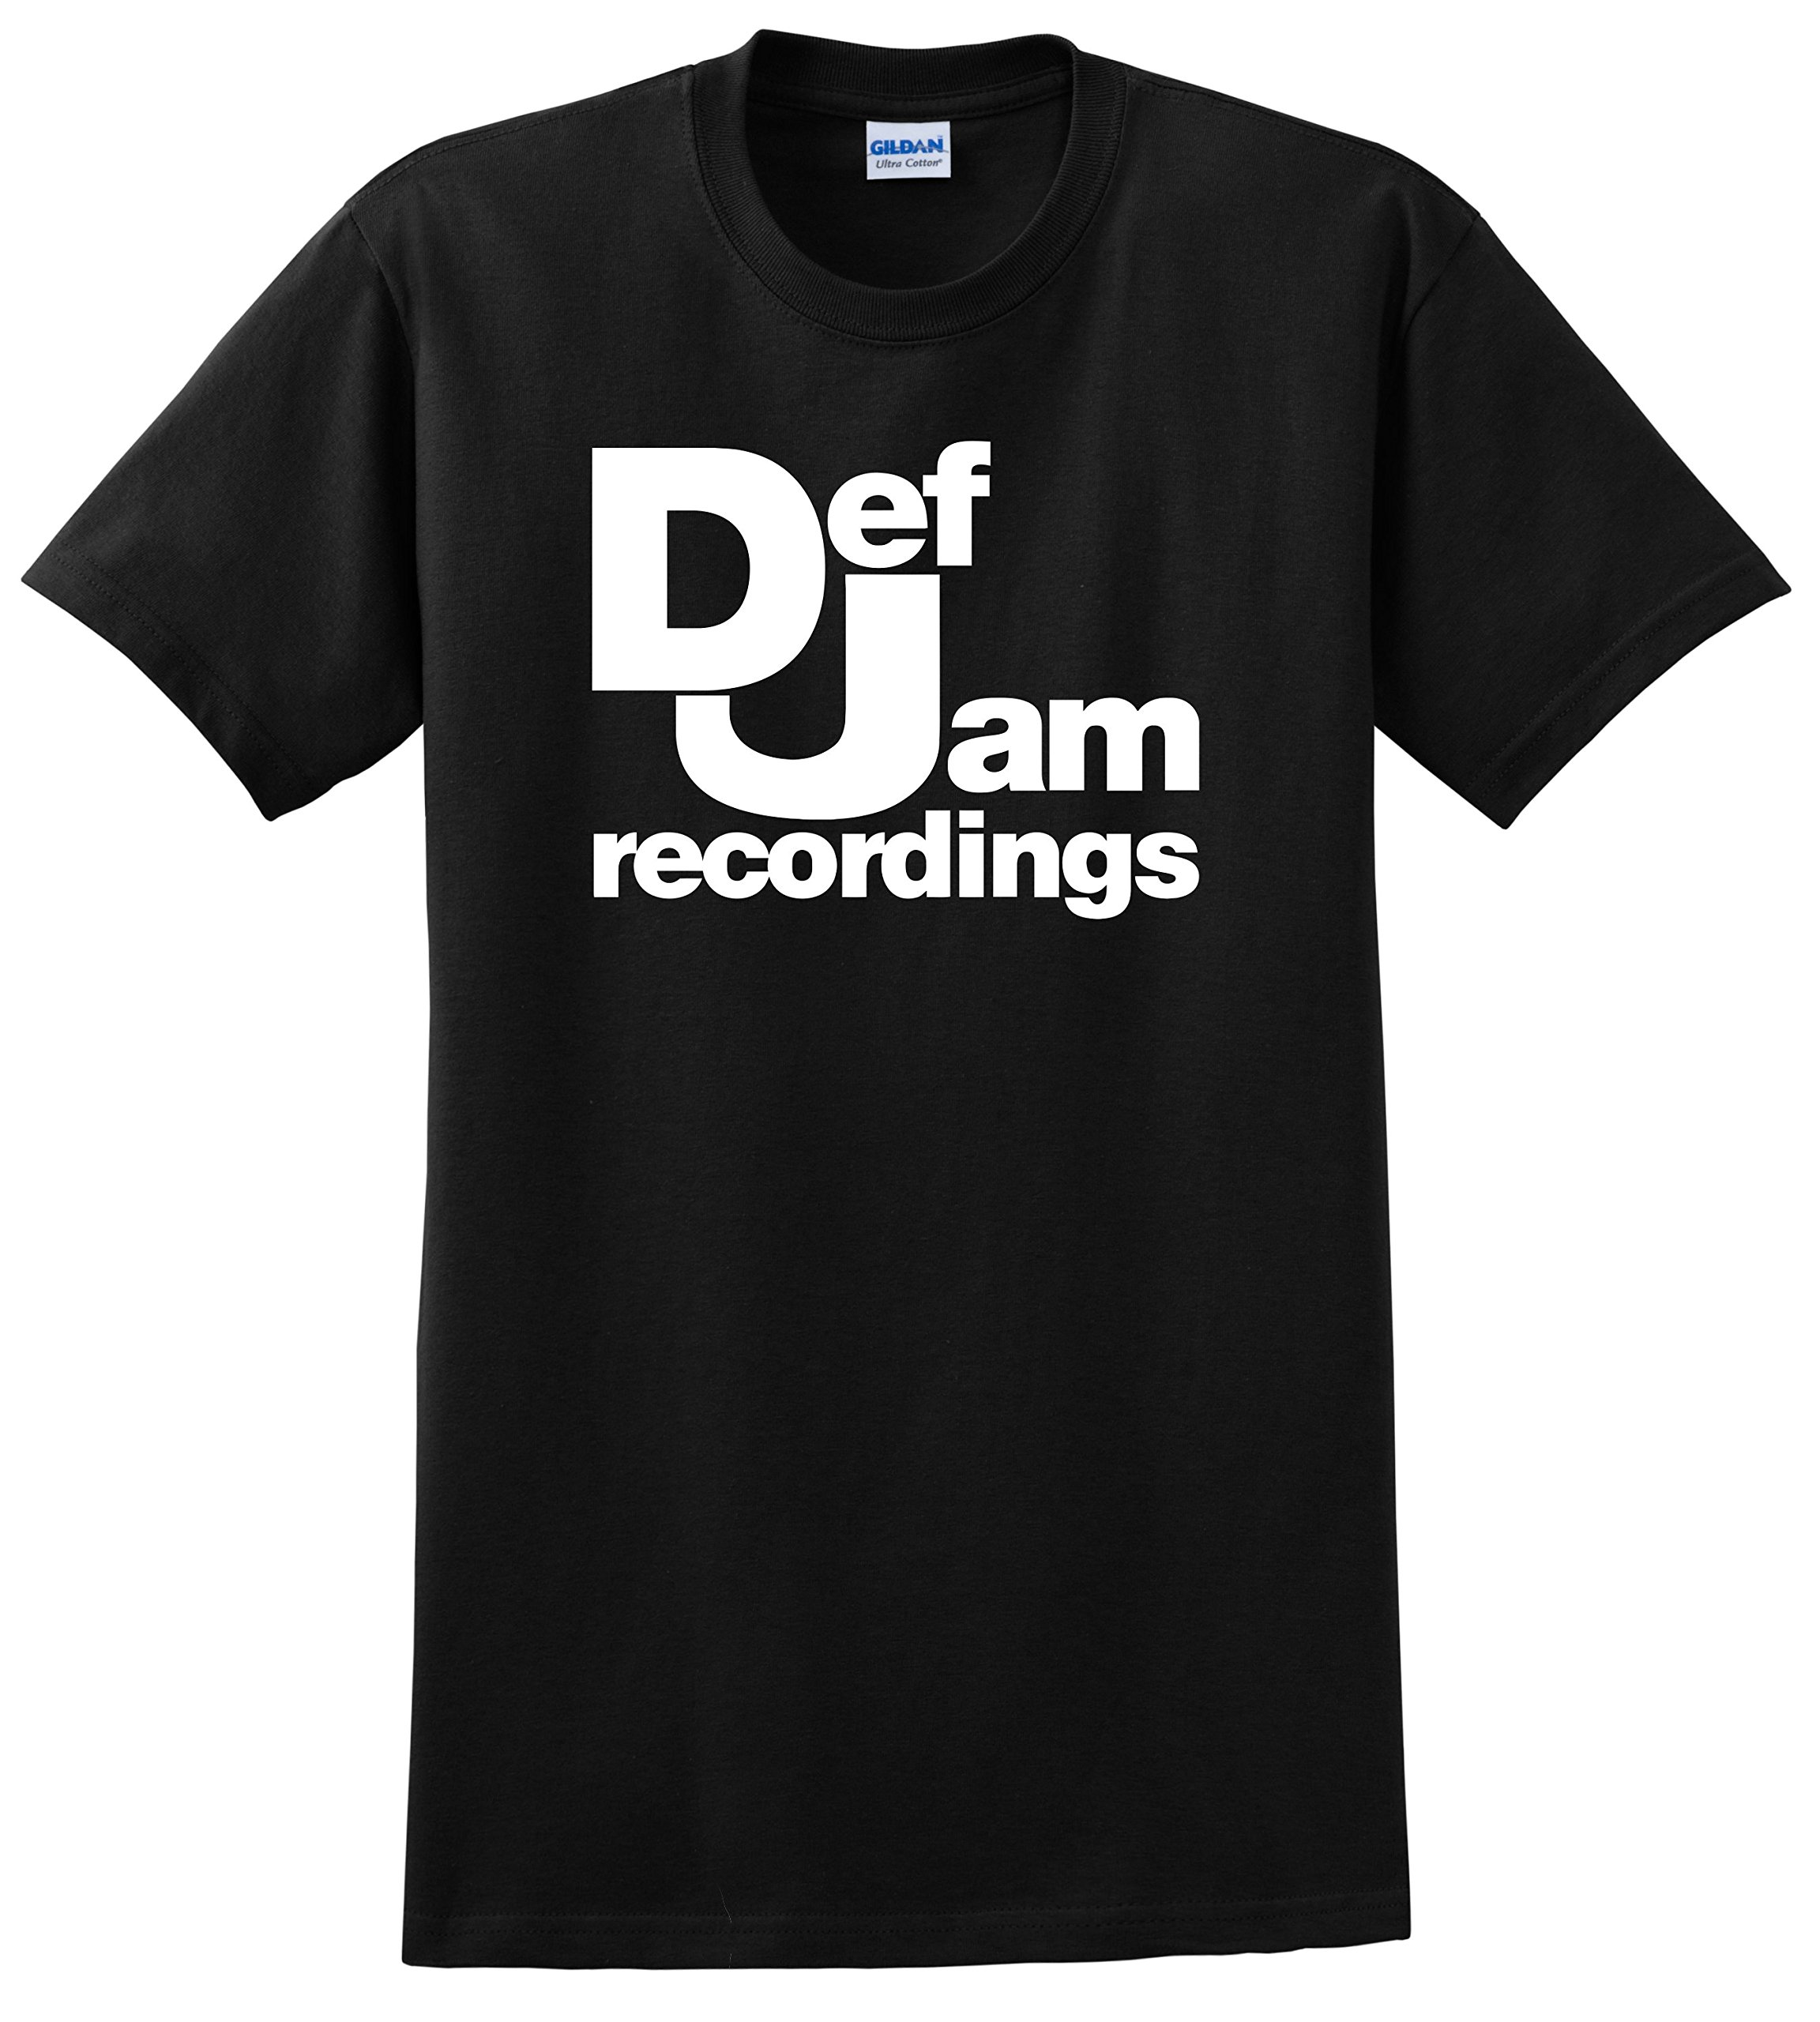 Def Jam Recordings T Shirt Classic Hip Hop Rap Music Unisex Ts